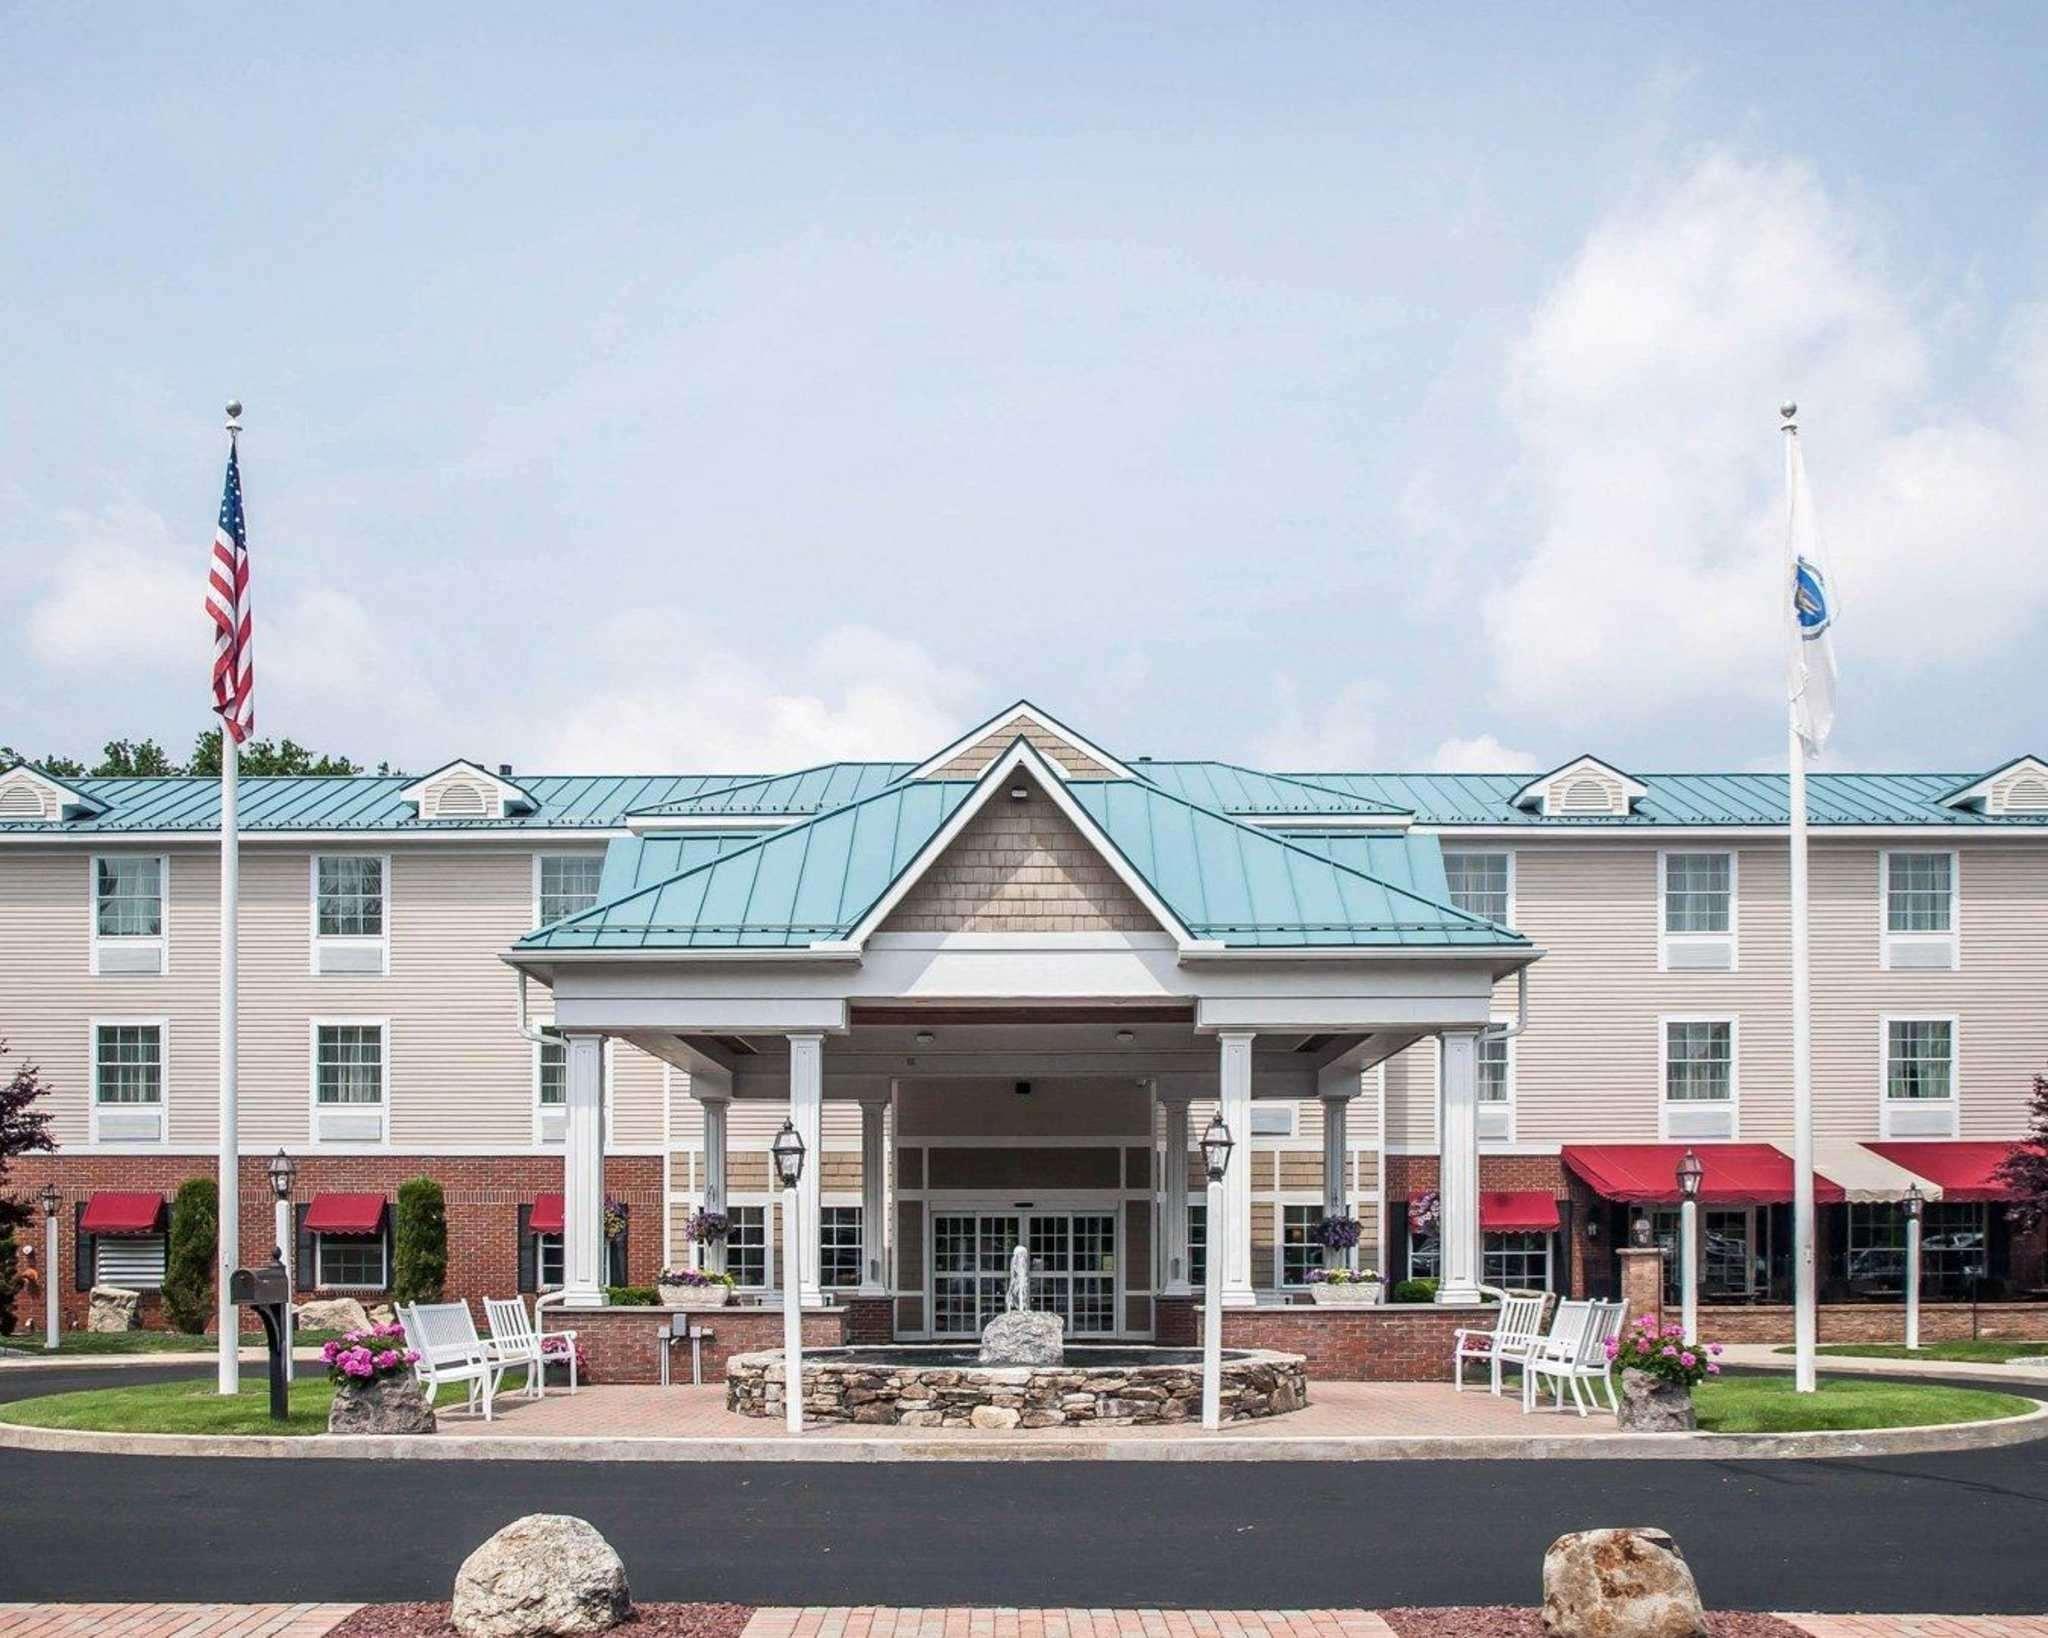 Comfort Inn & Suites Colonial, Worcester